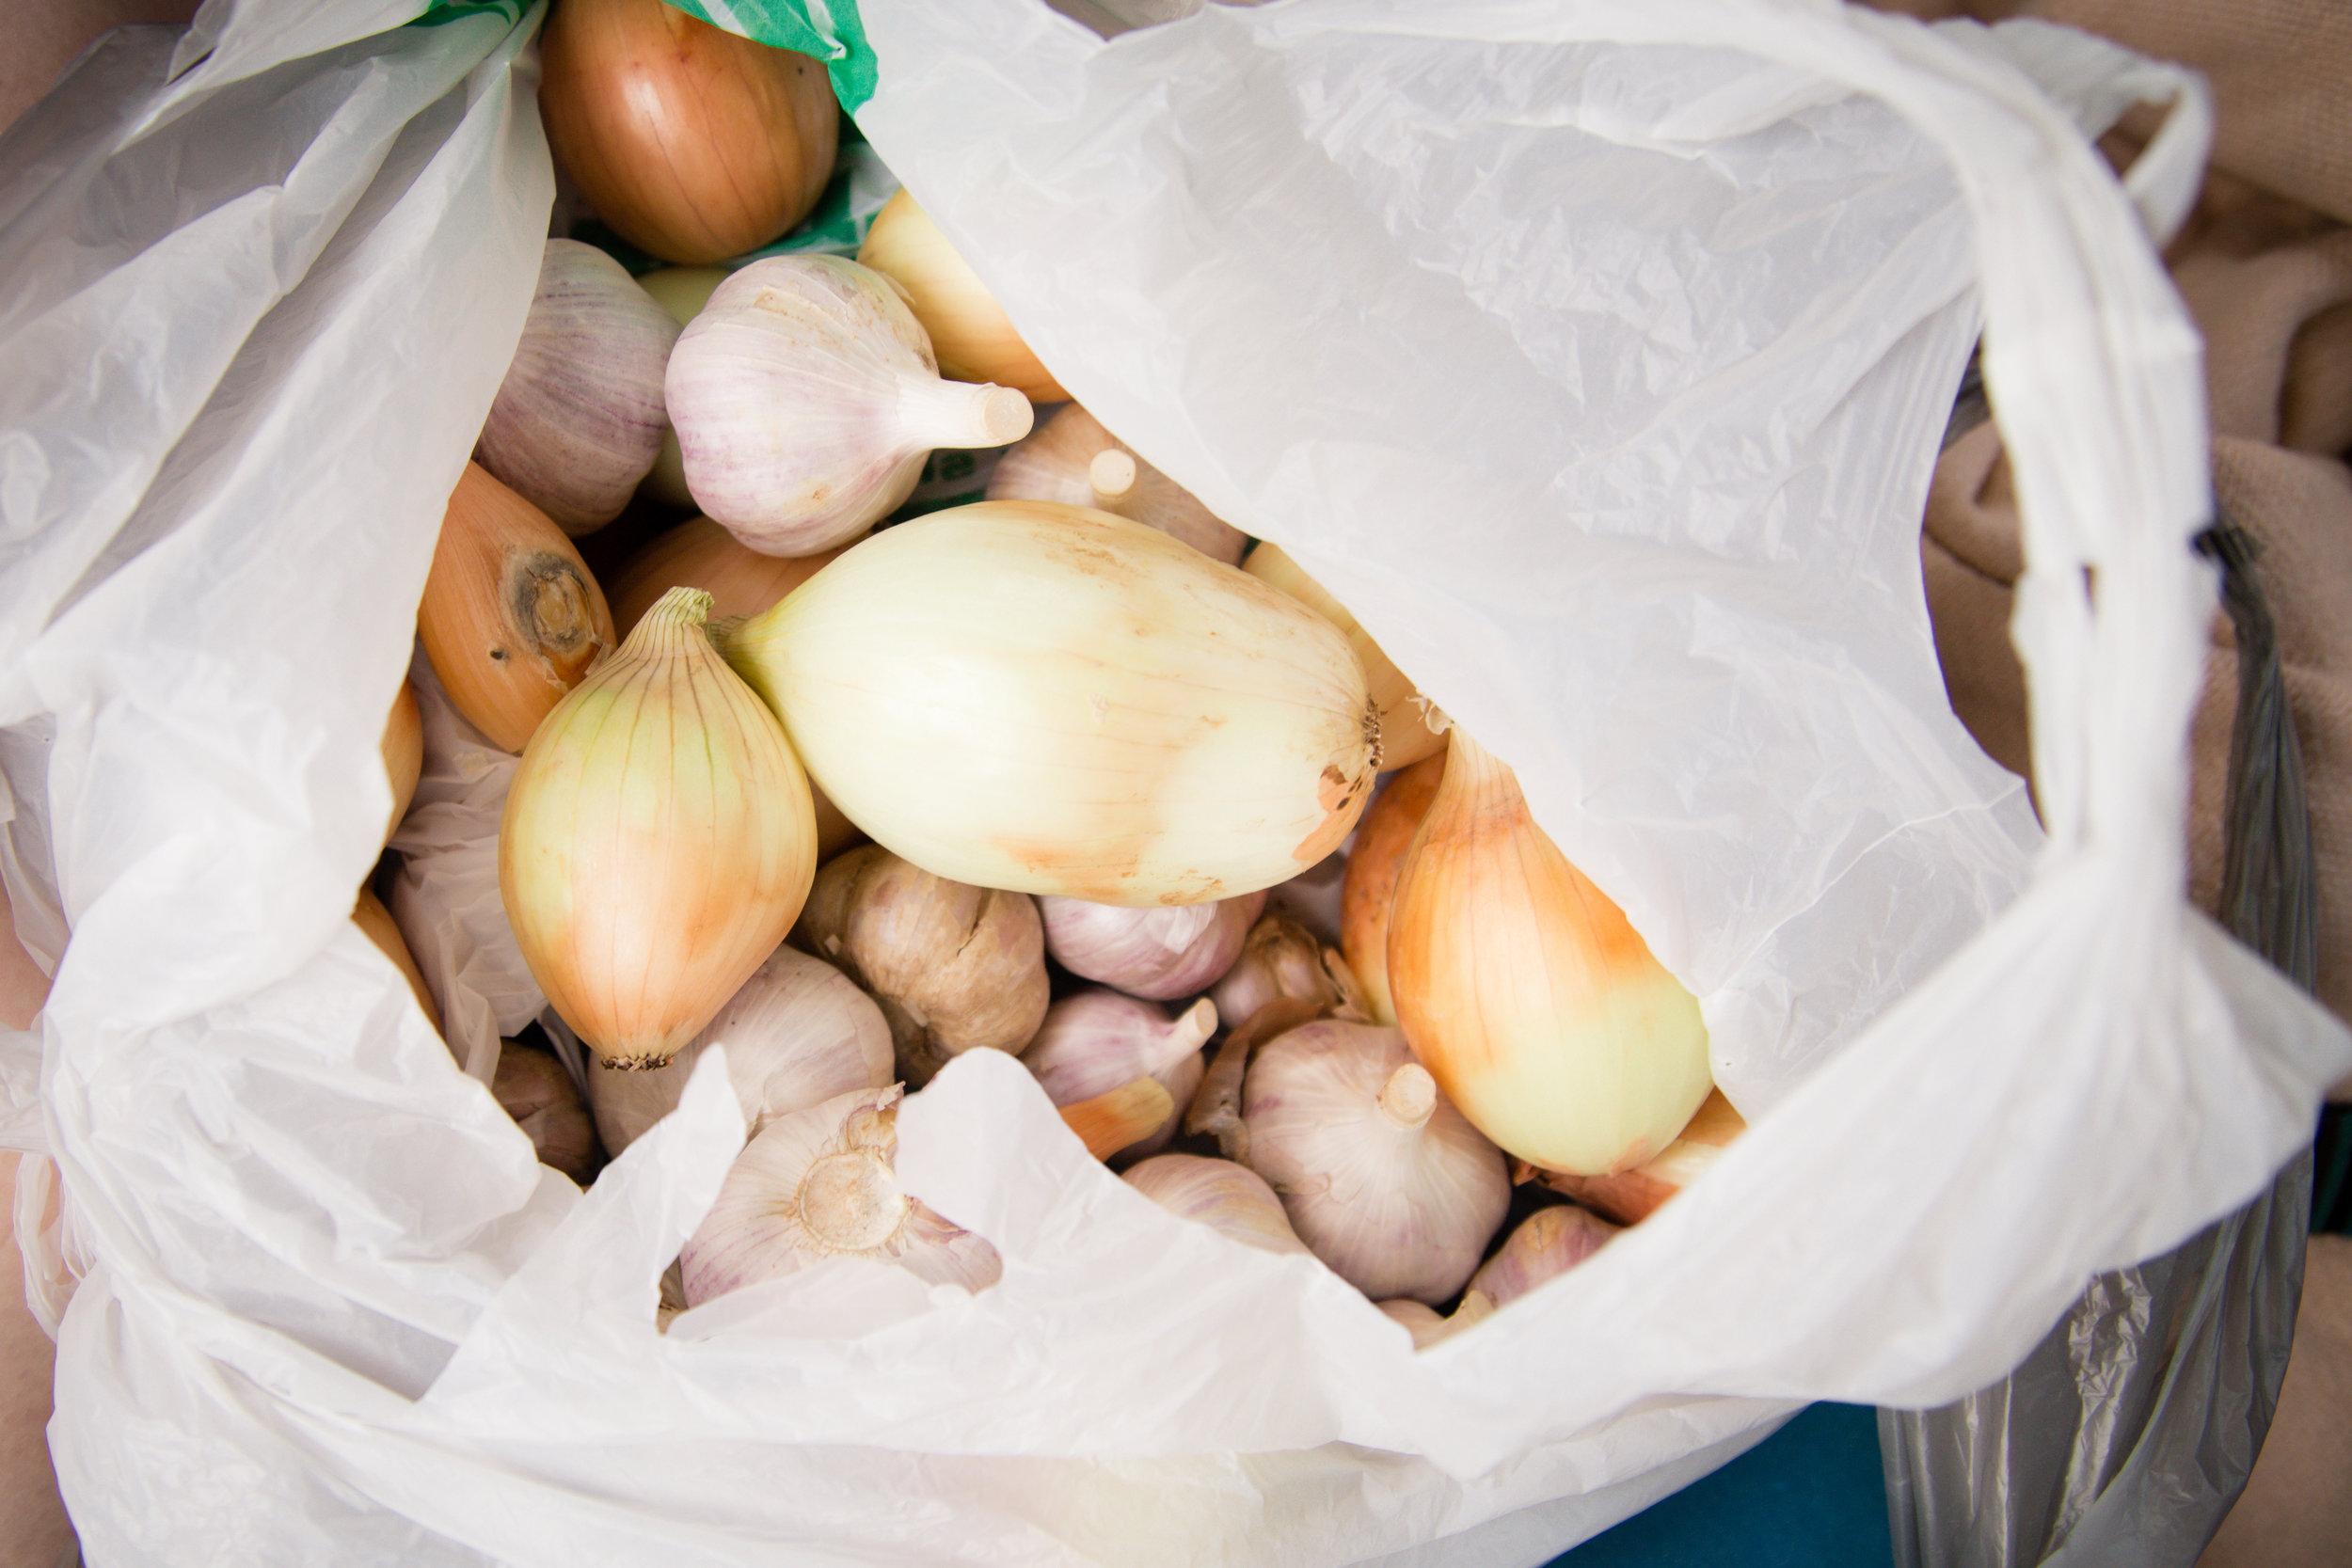 209 // 366 Onion haul from the farmer's market